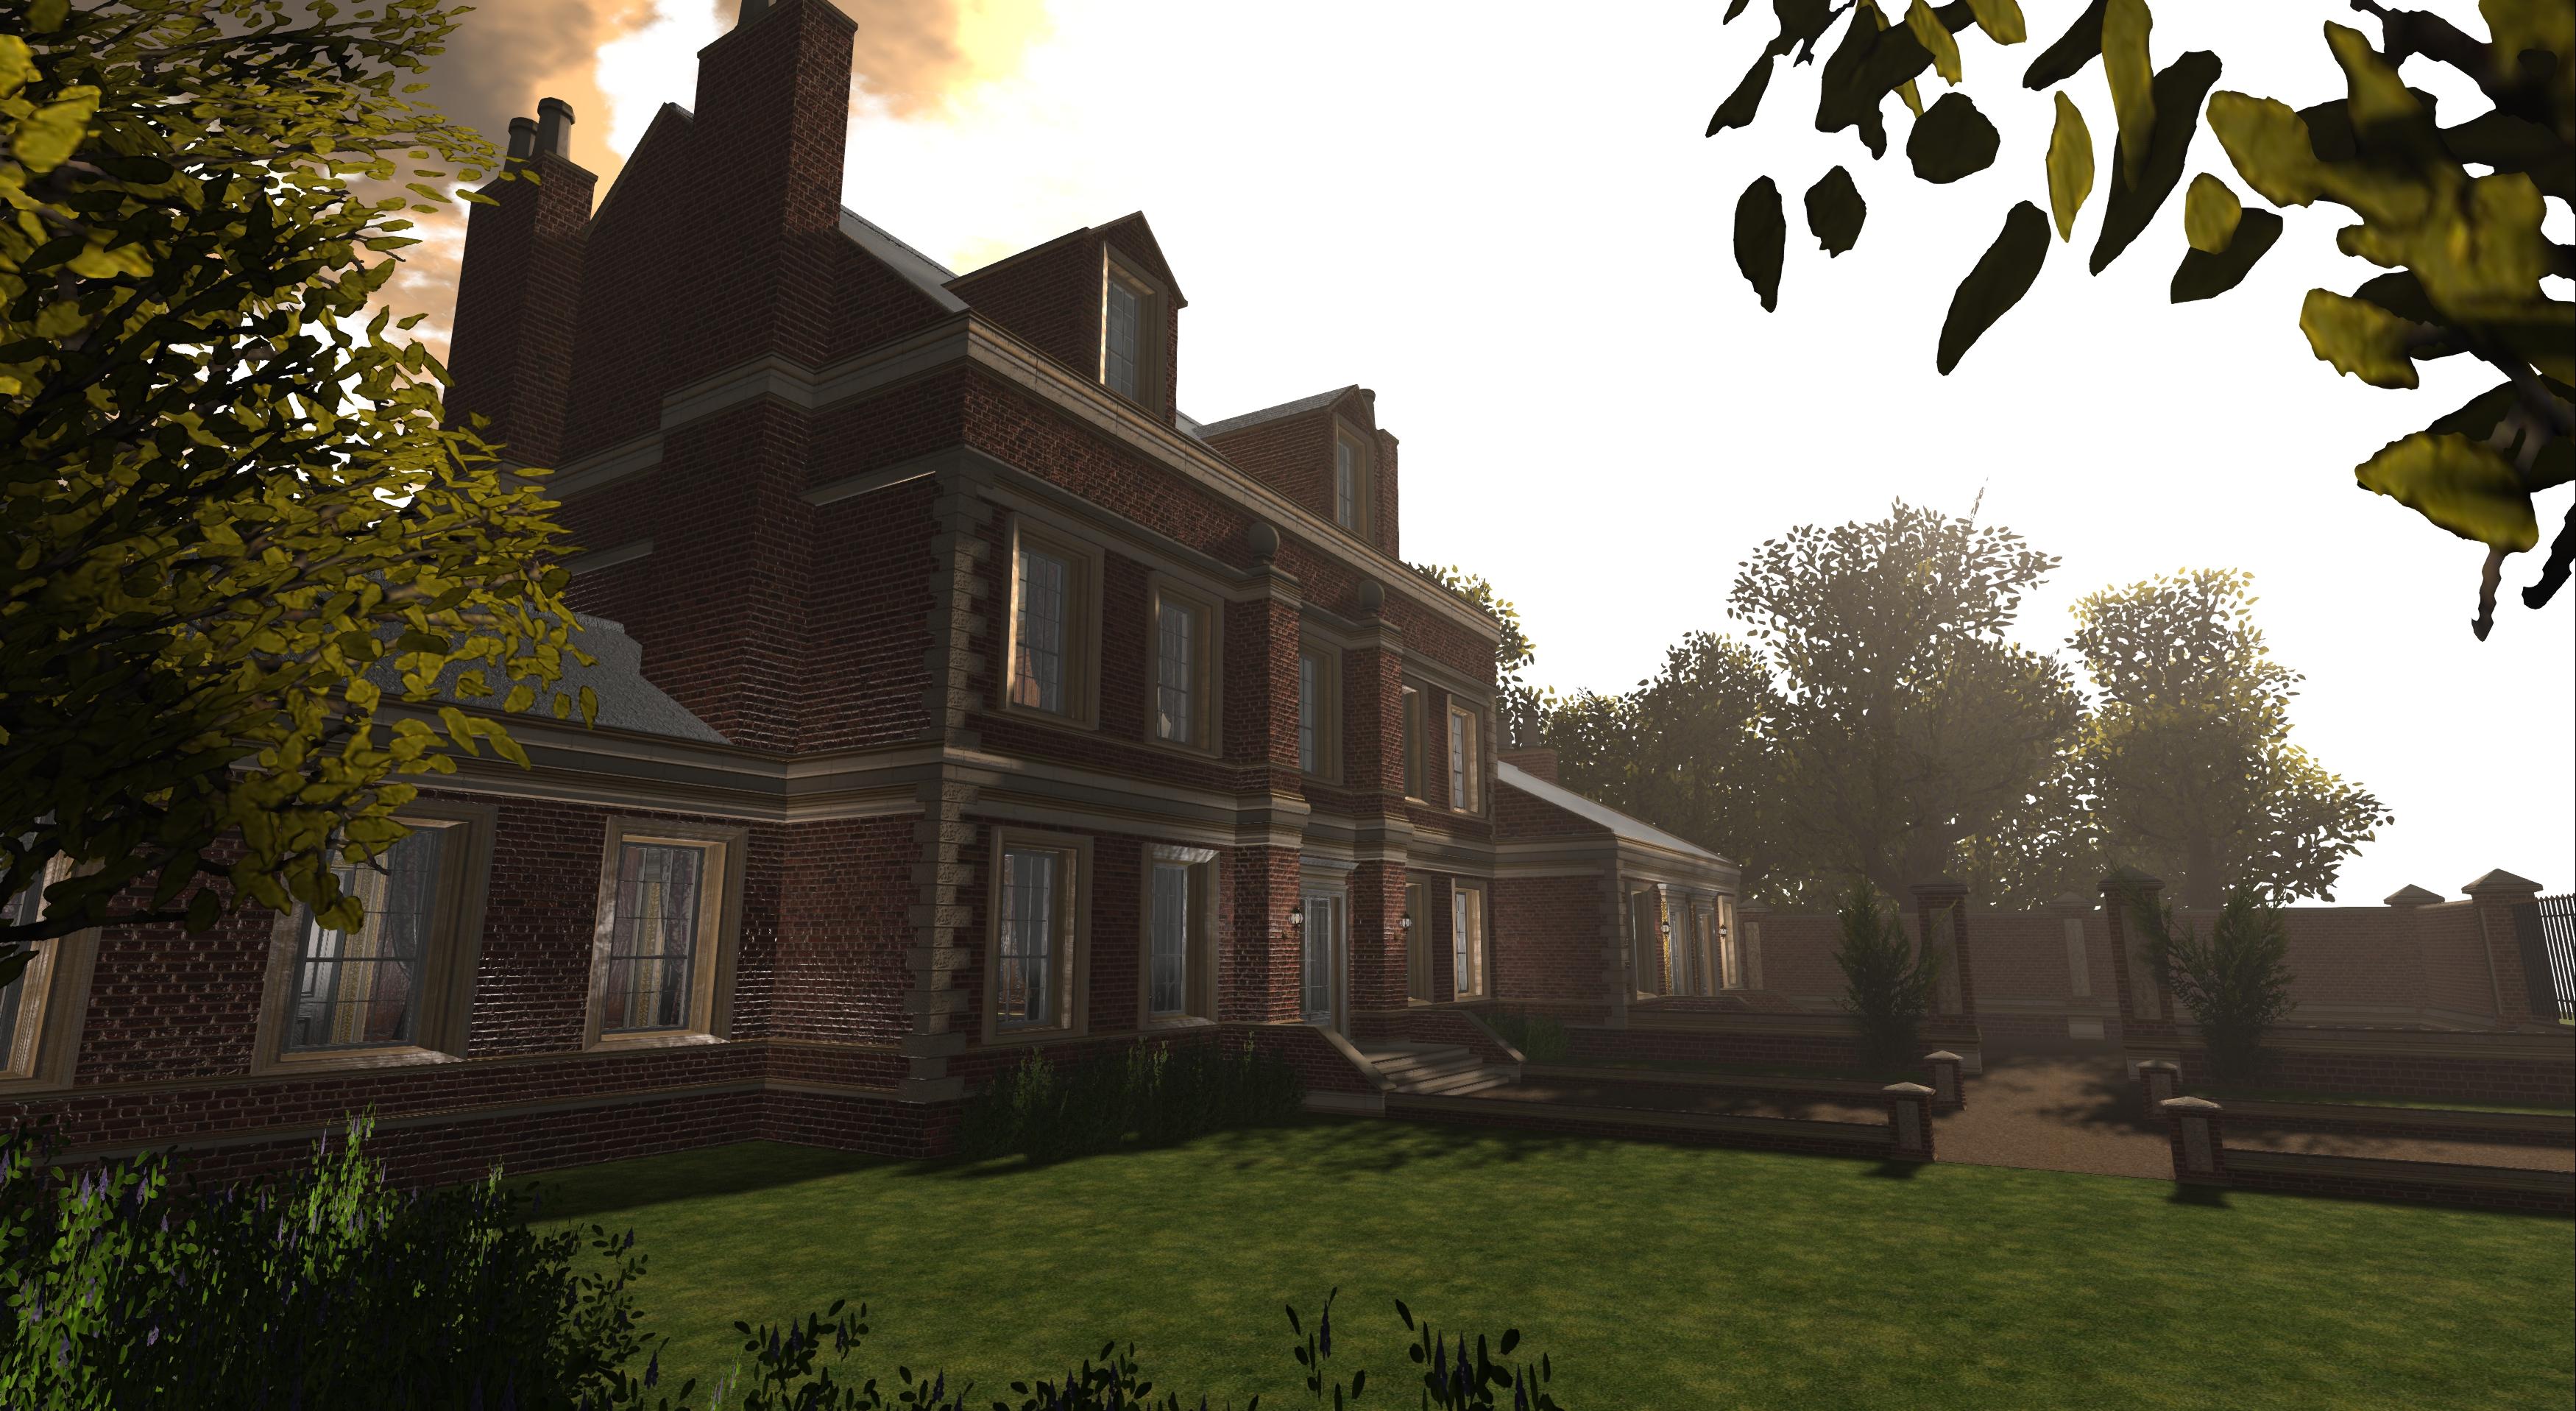 Dowager House External Textures_012